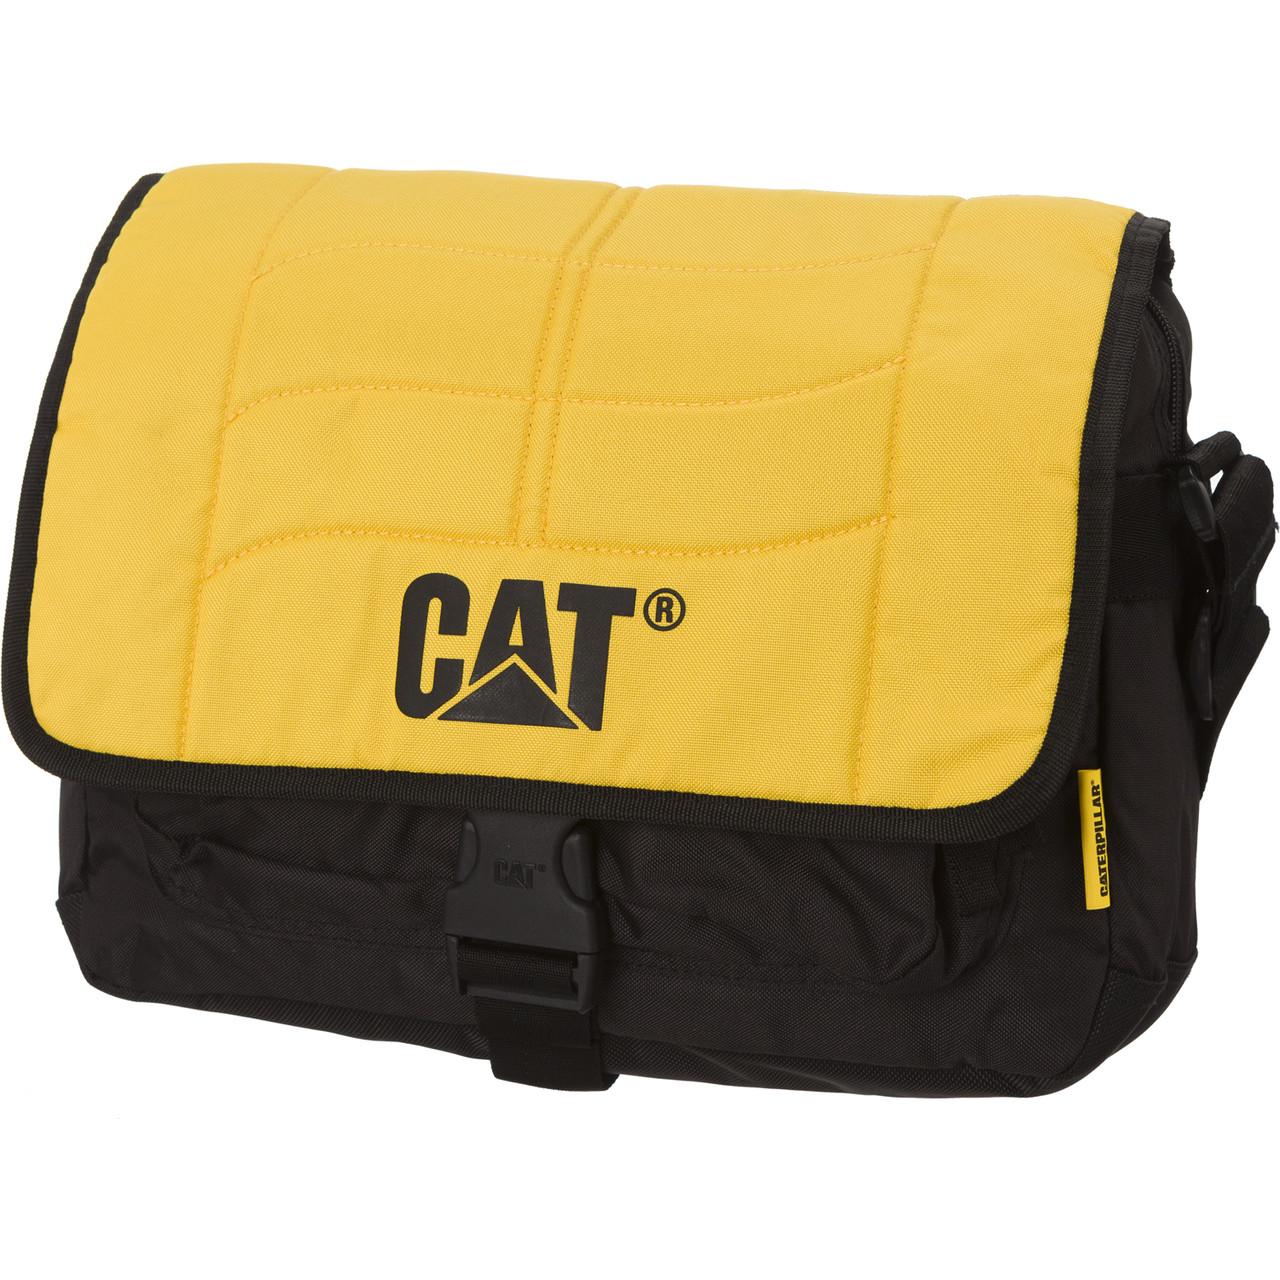 63c610aa9e391 Torba na laptop CAT® / Caterpillar® Curt - TORBY | WALIZKI - CAT-shop.pl